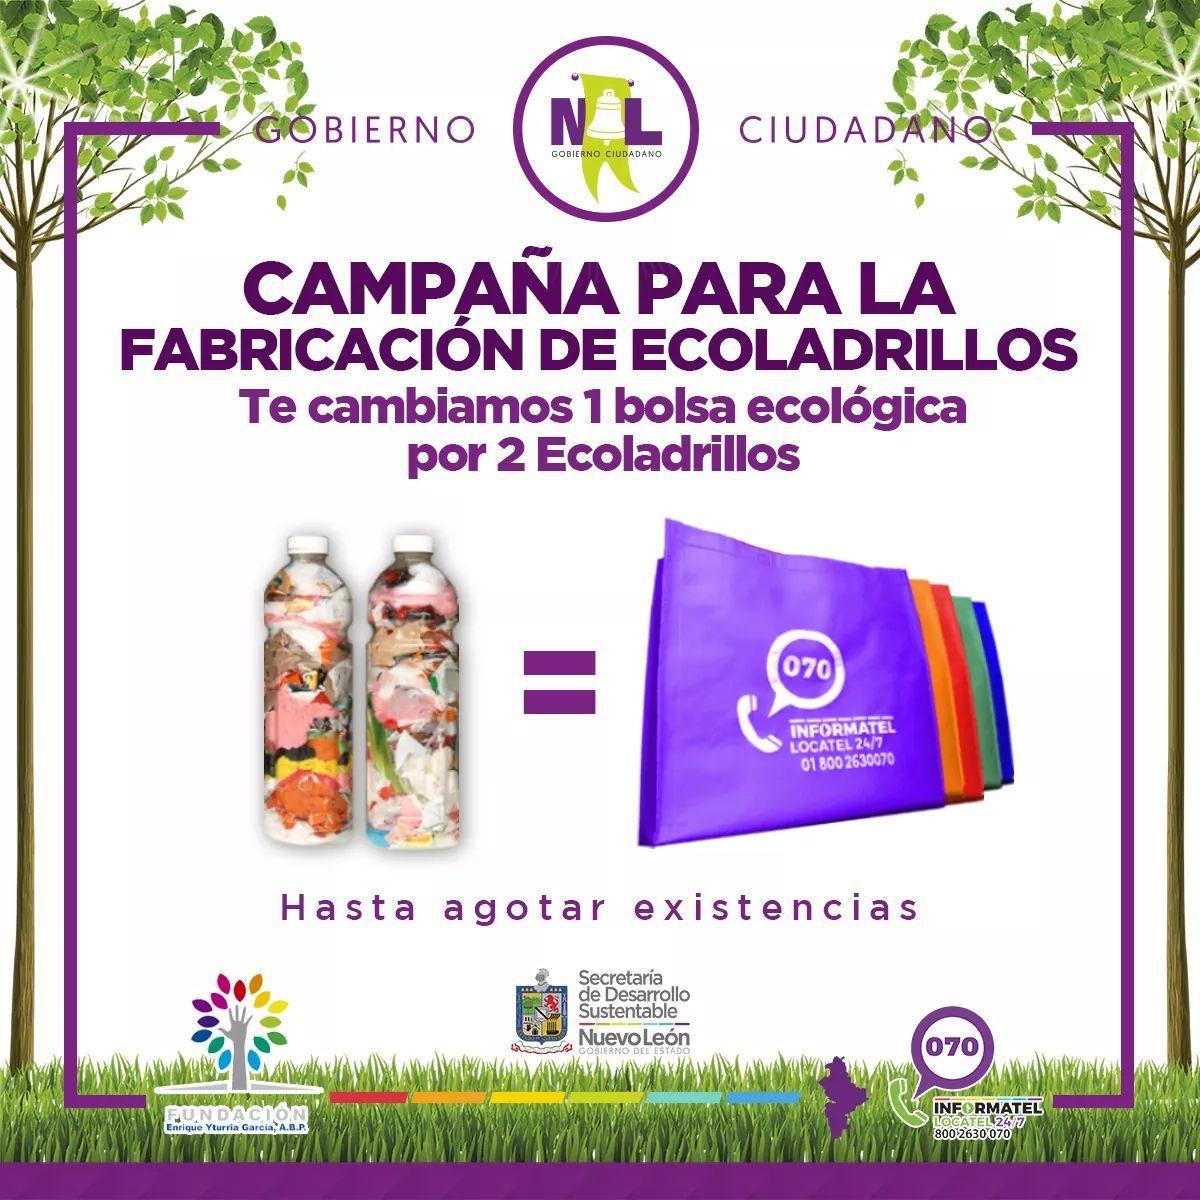 Monterrey: Cambia 2 ecoladrillos por 1 bolsa ecológica.